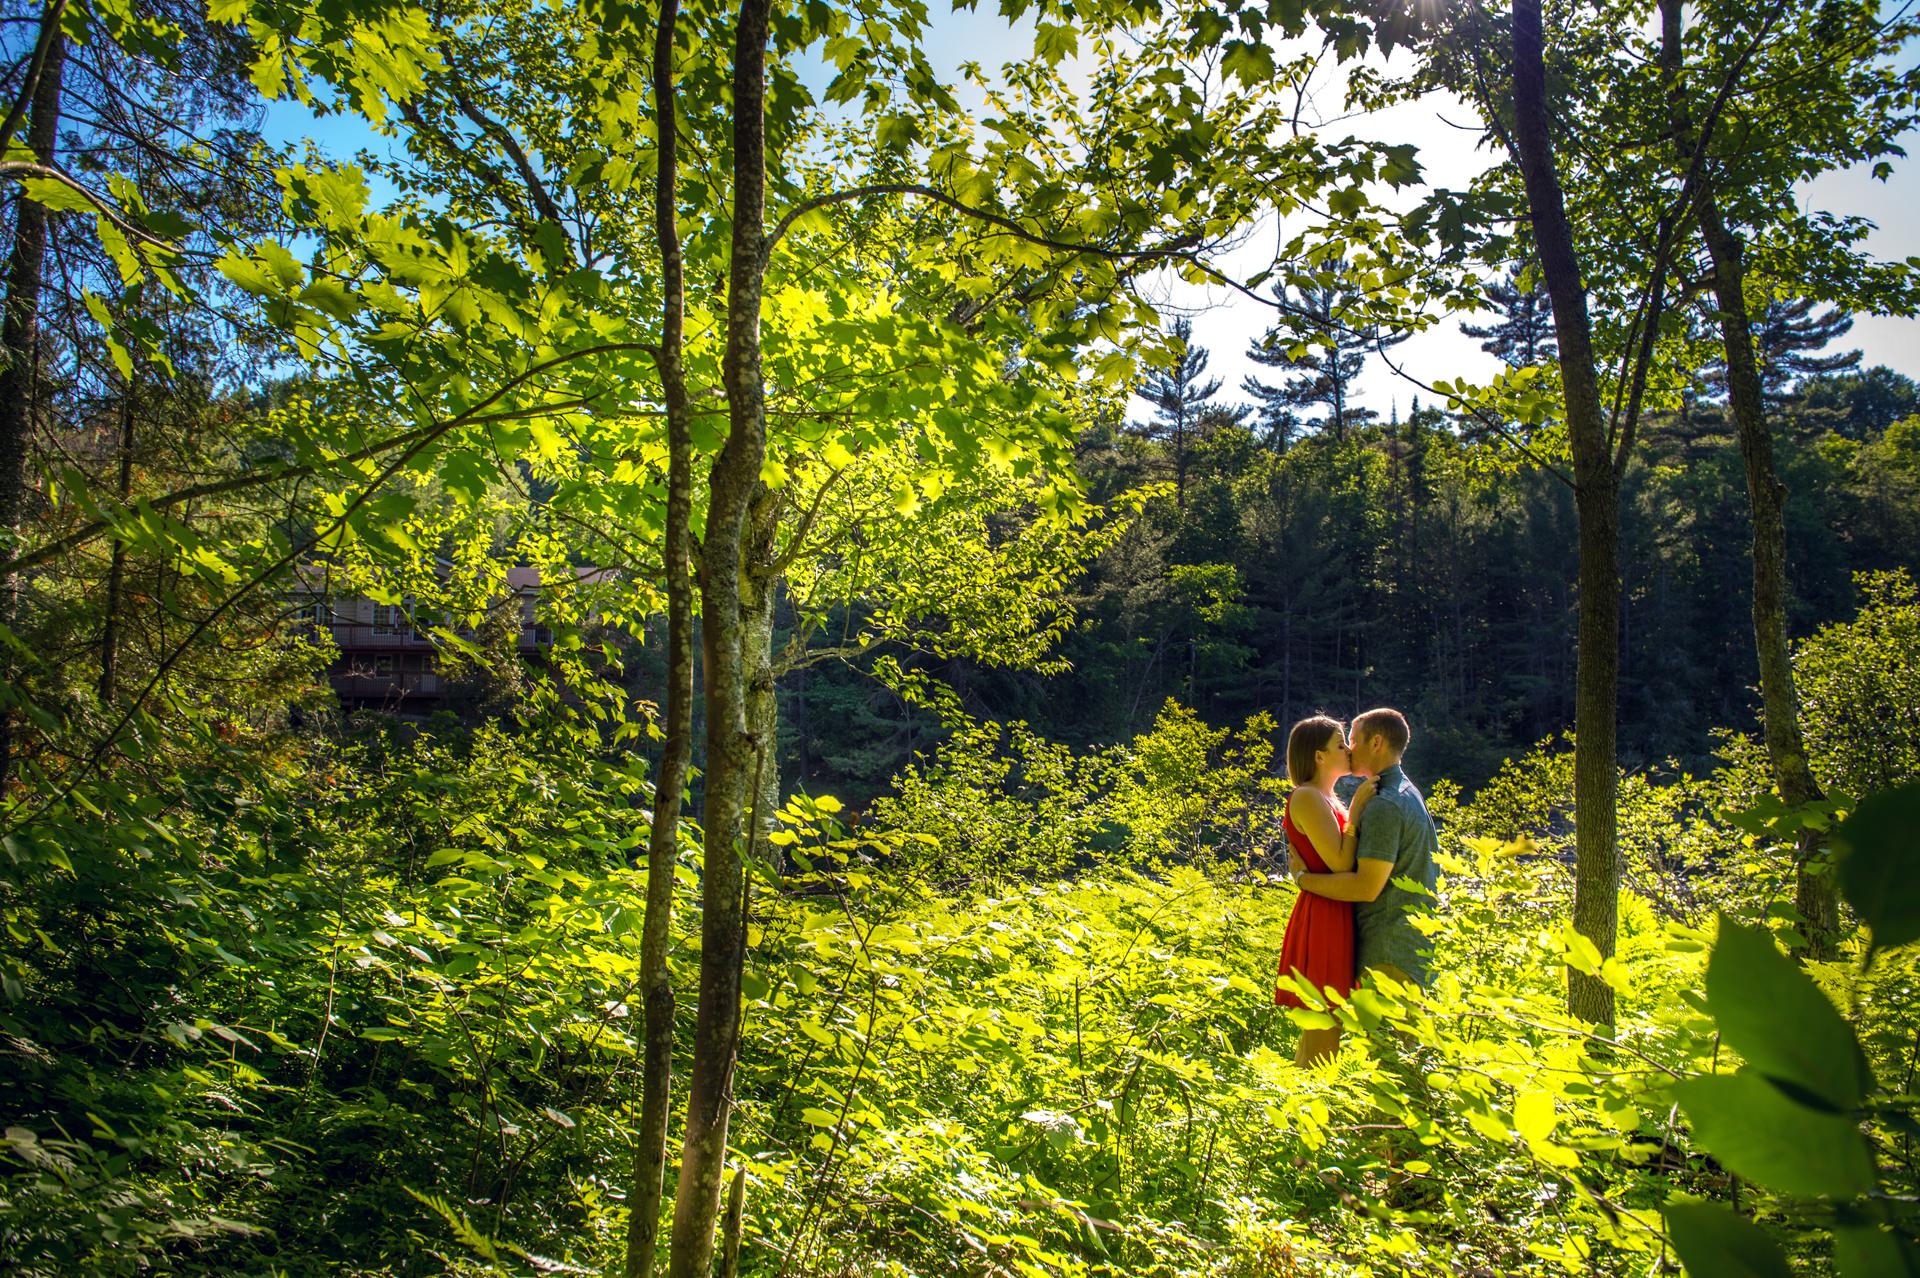 Matt Amp Kristi Lee Muskoka Engagement Photos Huntsville Photographer Blog David Amp Sherry